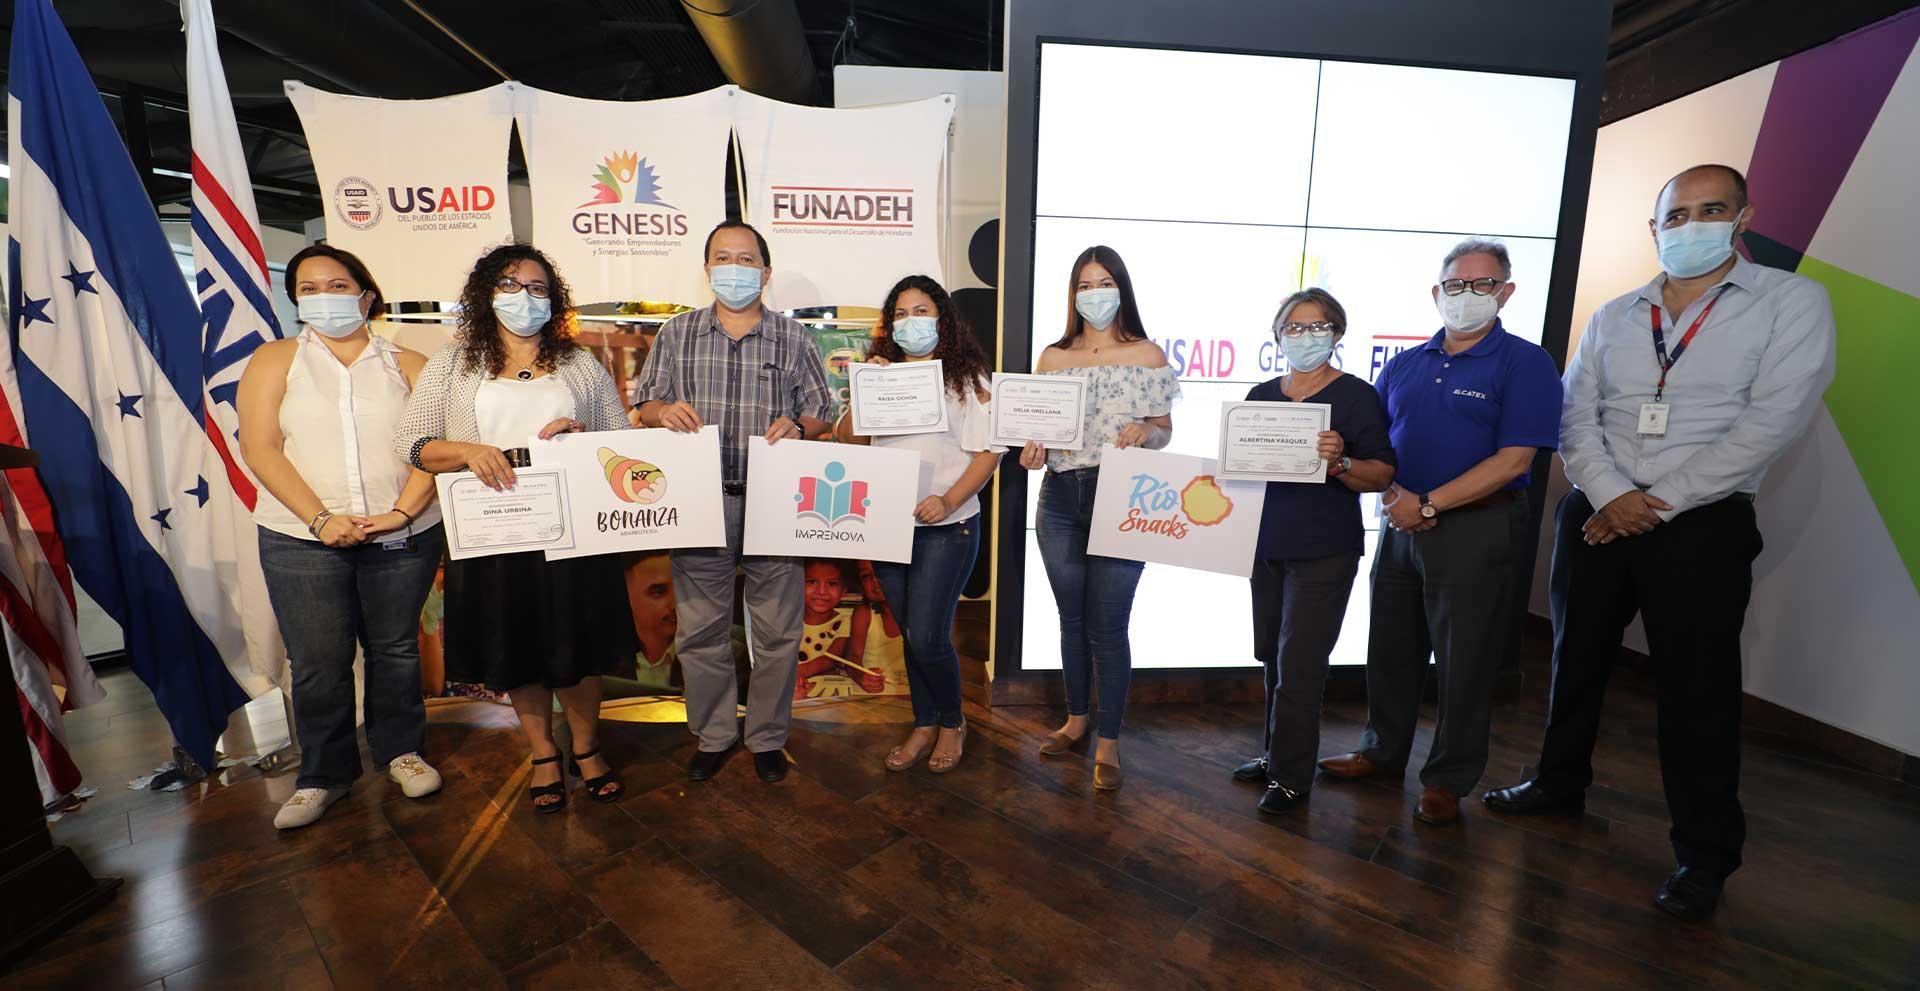 Elcatex Group and FUNADEH Supporting Entrepreneurship